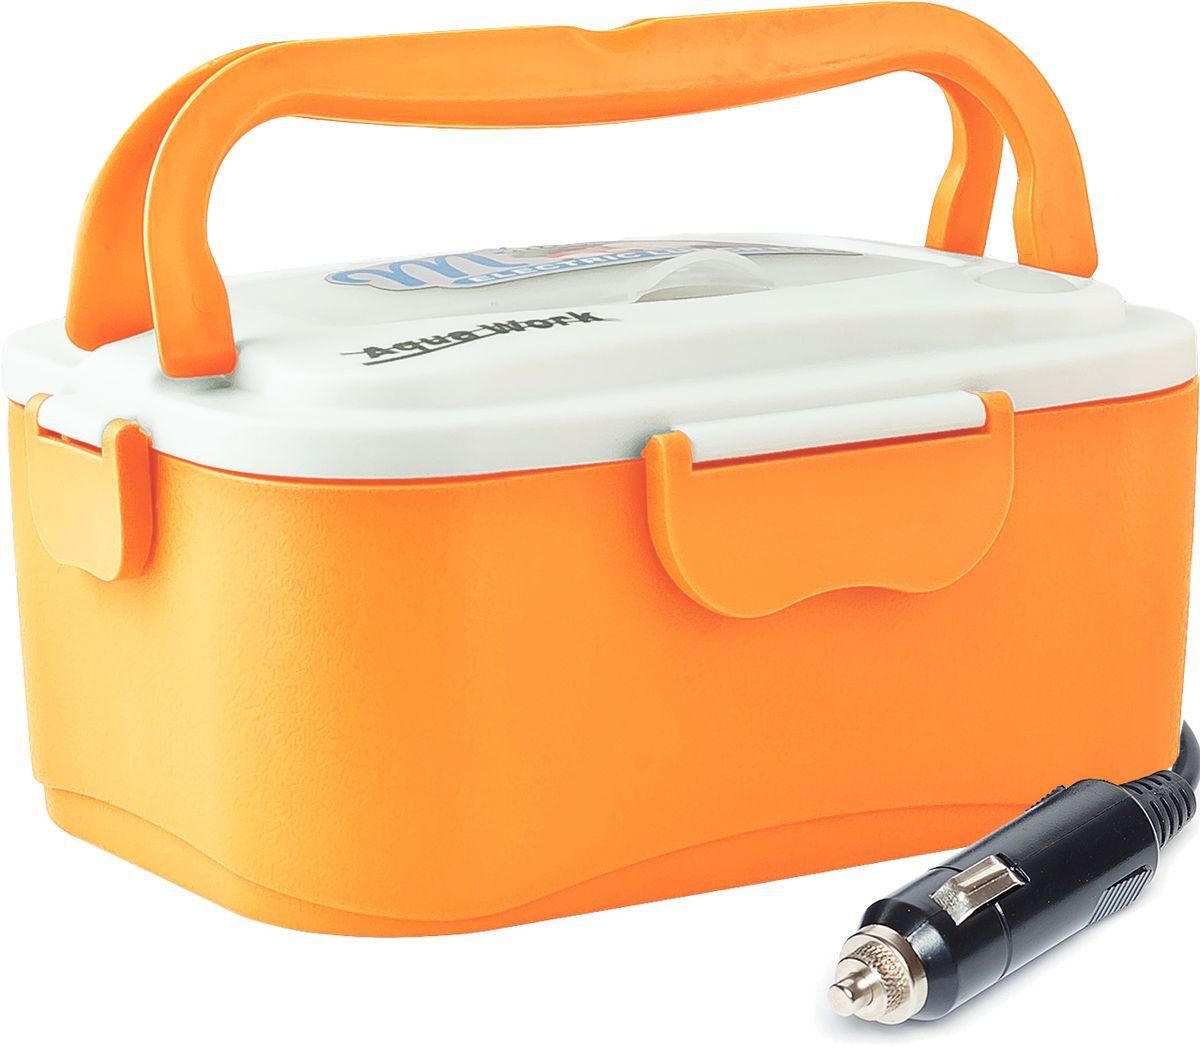 Aqua Work С5, Orange ланч-бокс с подогревом 1,05 л - Прочая техника